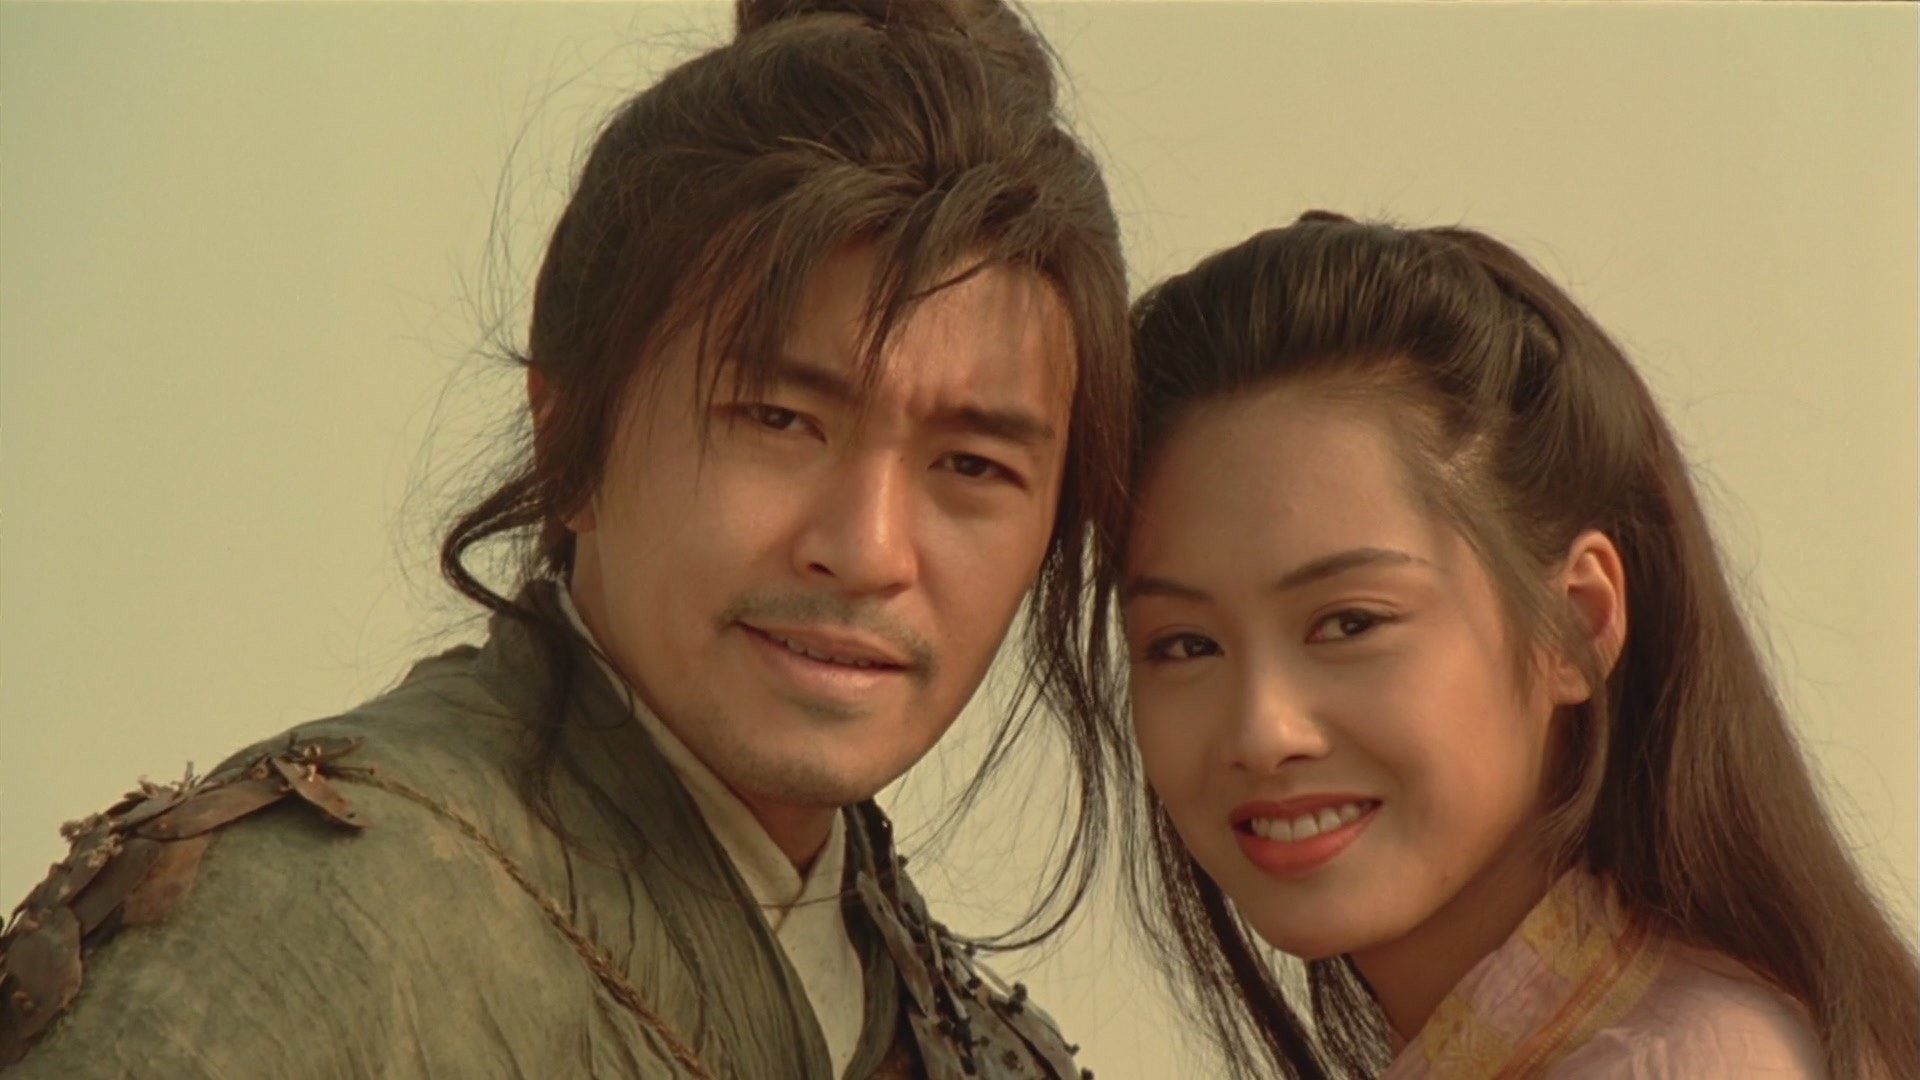 西遊記大結局之仙履奇緣 - A Chinese Odyssey Part 2: Cinderella(1995)Hong Kong__My  Rating:9.0/10__Director:劉鎮偉__Stars:周星馳、吳孟達、藍潔瑛、莫文蔚、江約誠、陸樹銘、… | I movie,  Cinematography, Movies